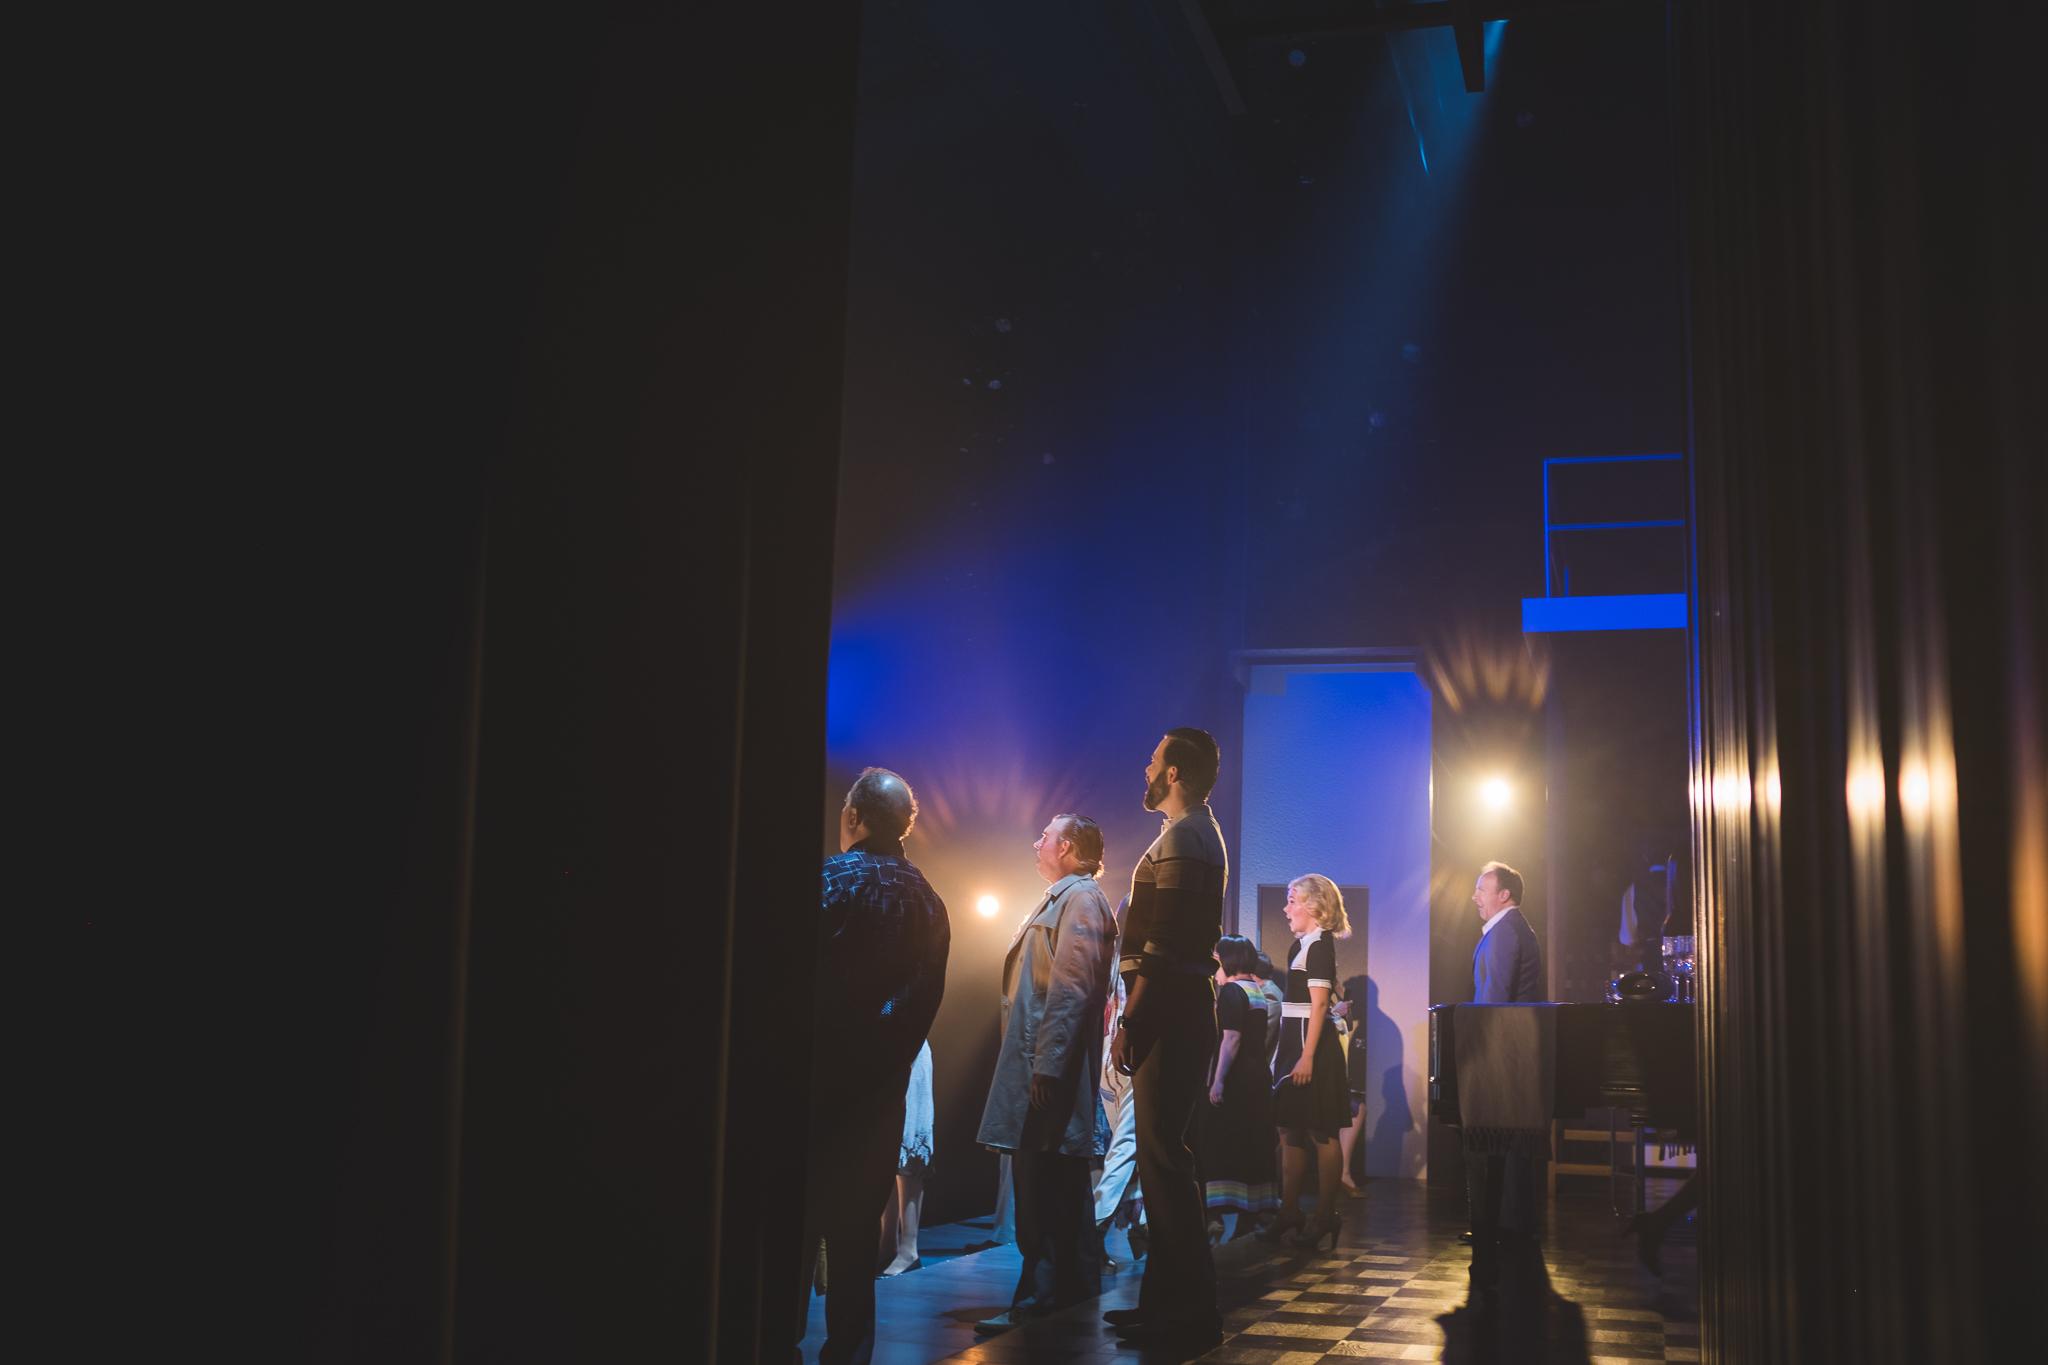 8.)Merrily_Backstage_rolling along cast, Nile Scott Shots.jpg